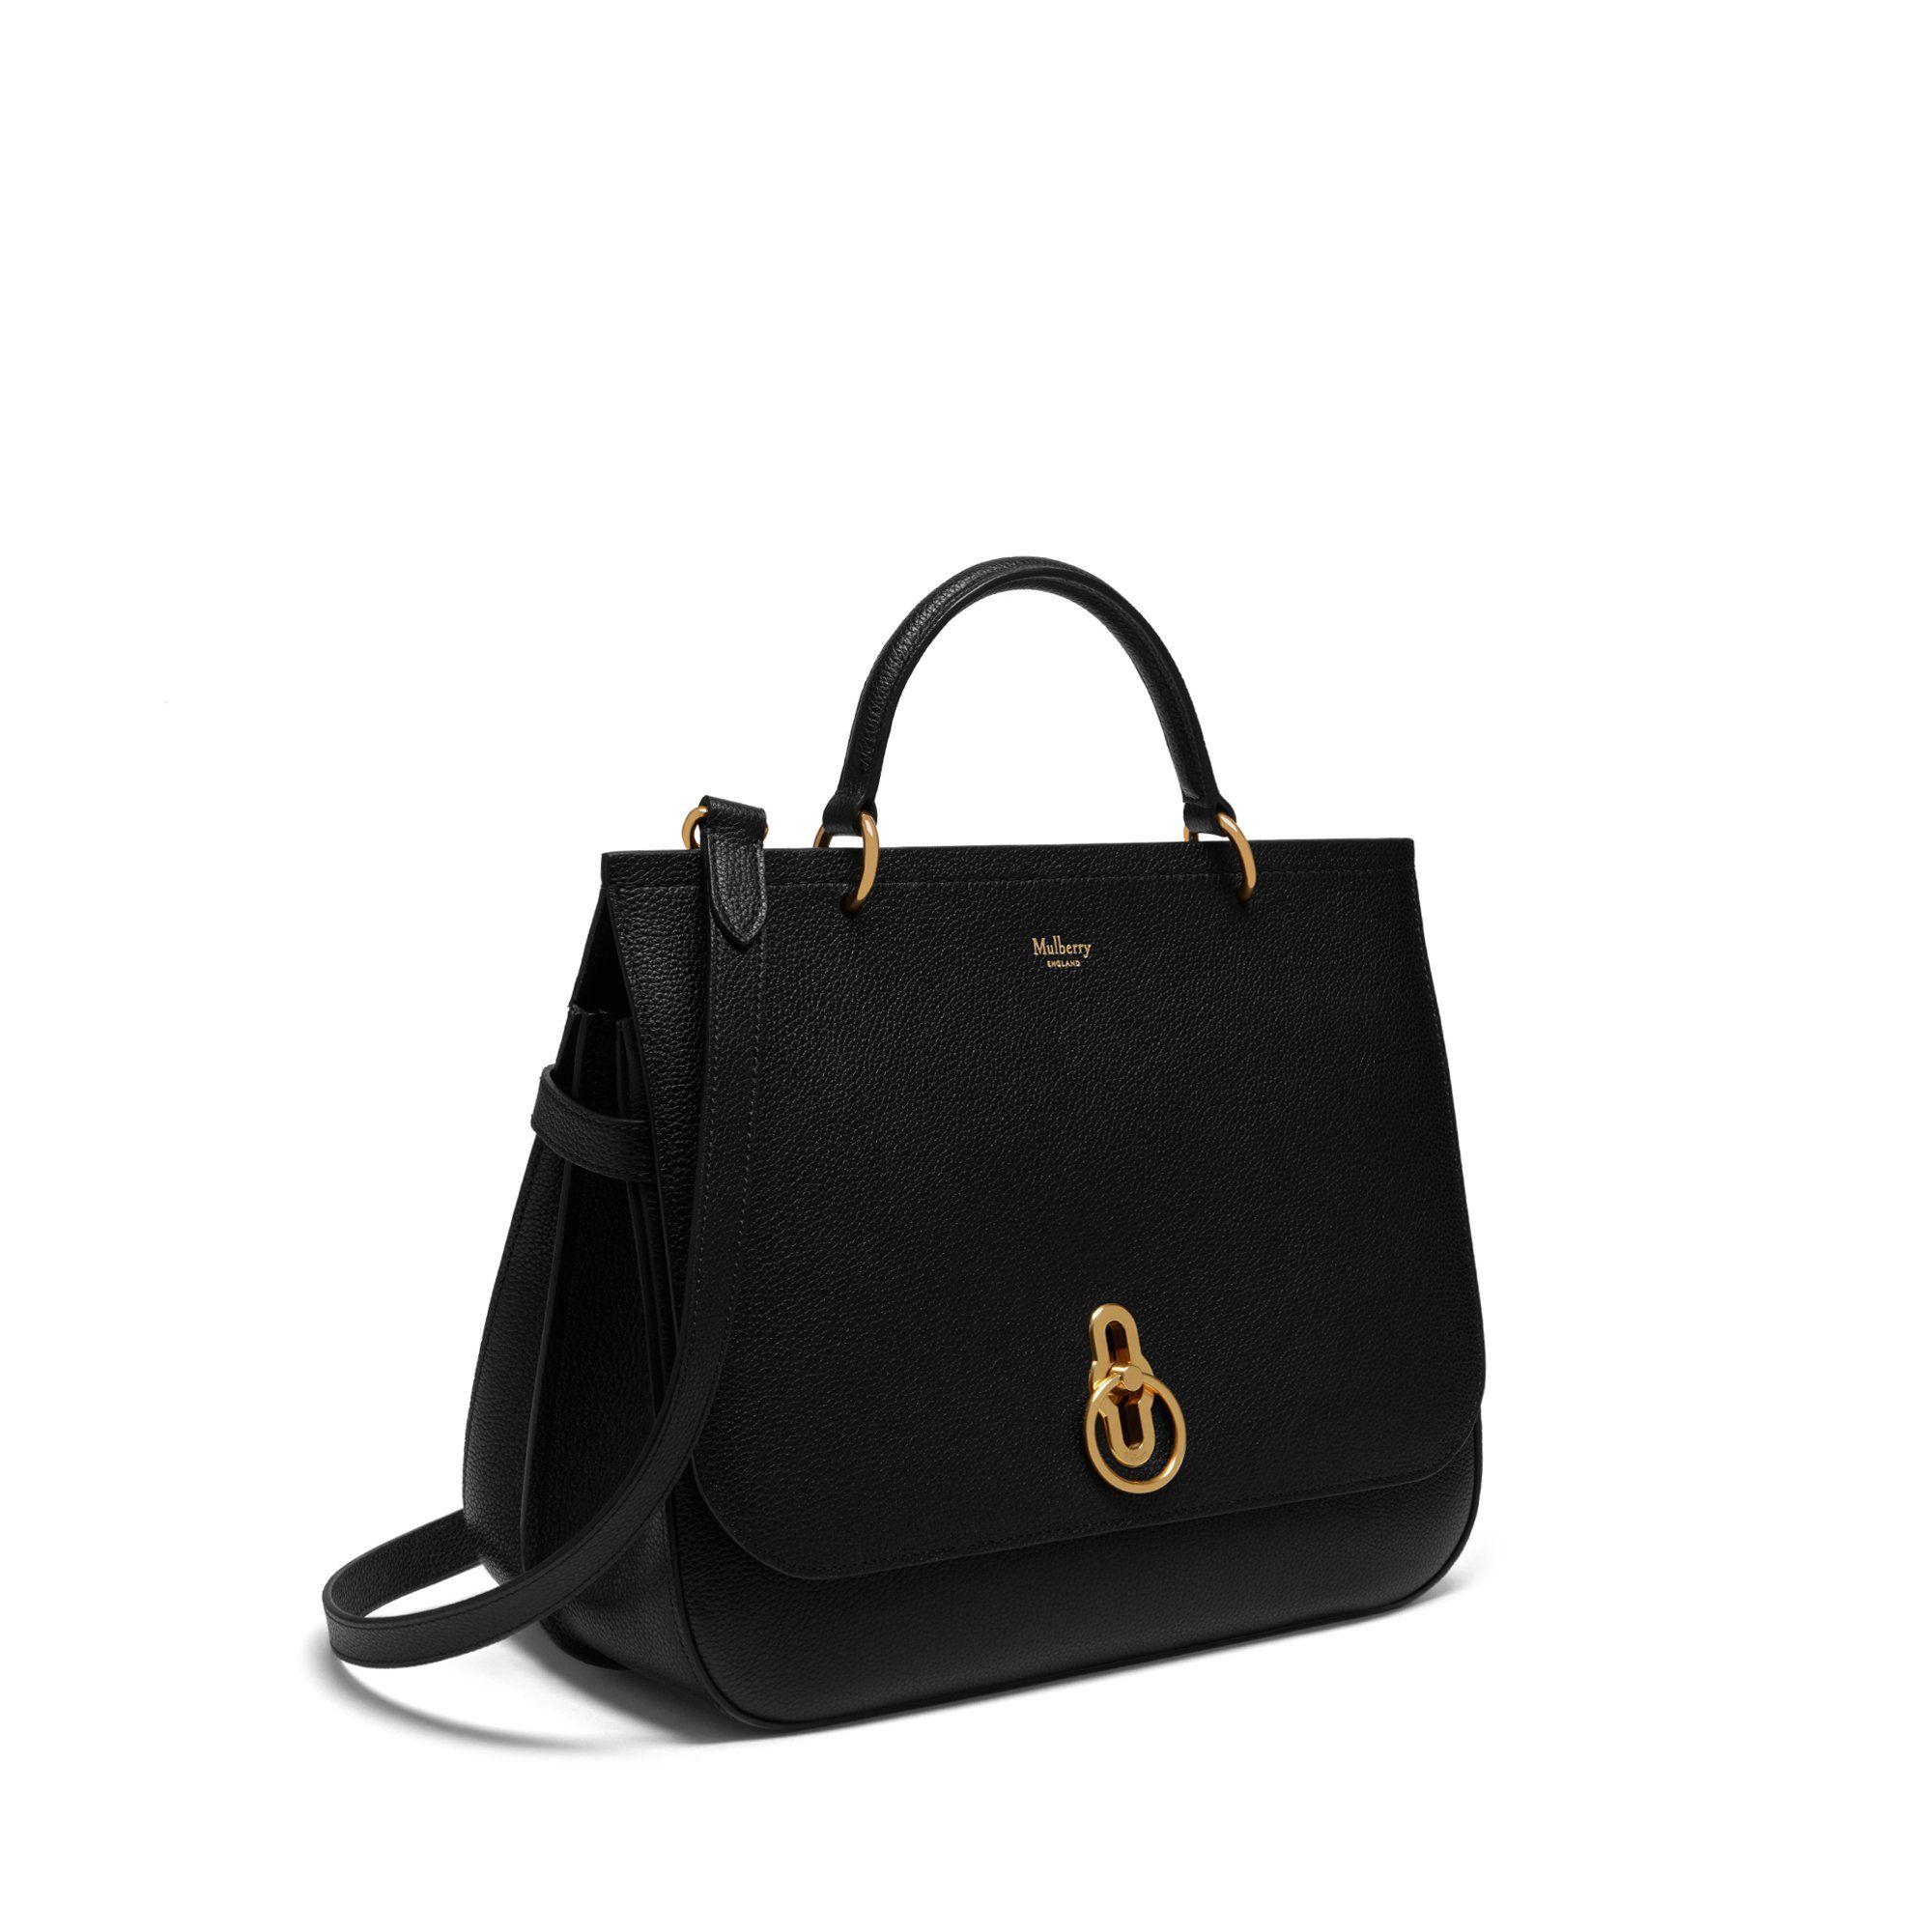 Bags Bags Mulberry Women Women Women Mulberry Shoulder Bags Women's Shoulder Mulberry Women's Shoulder Shoulder Women's SPCaq